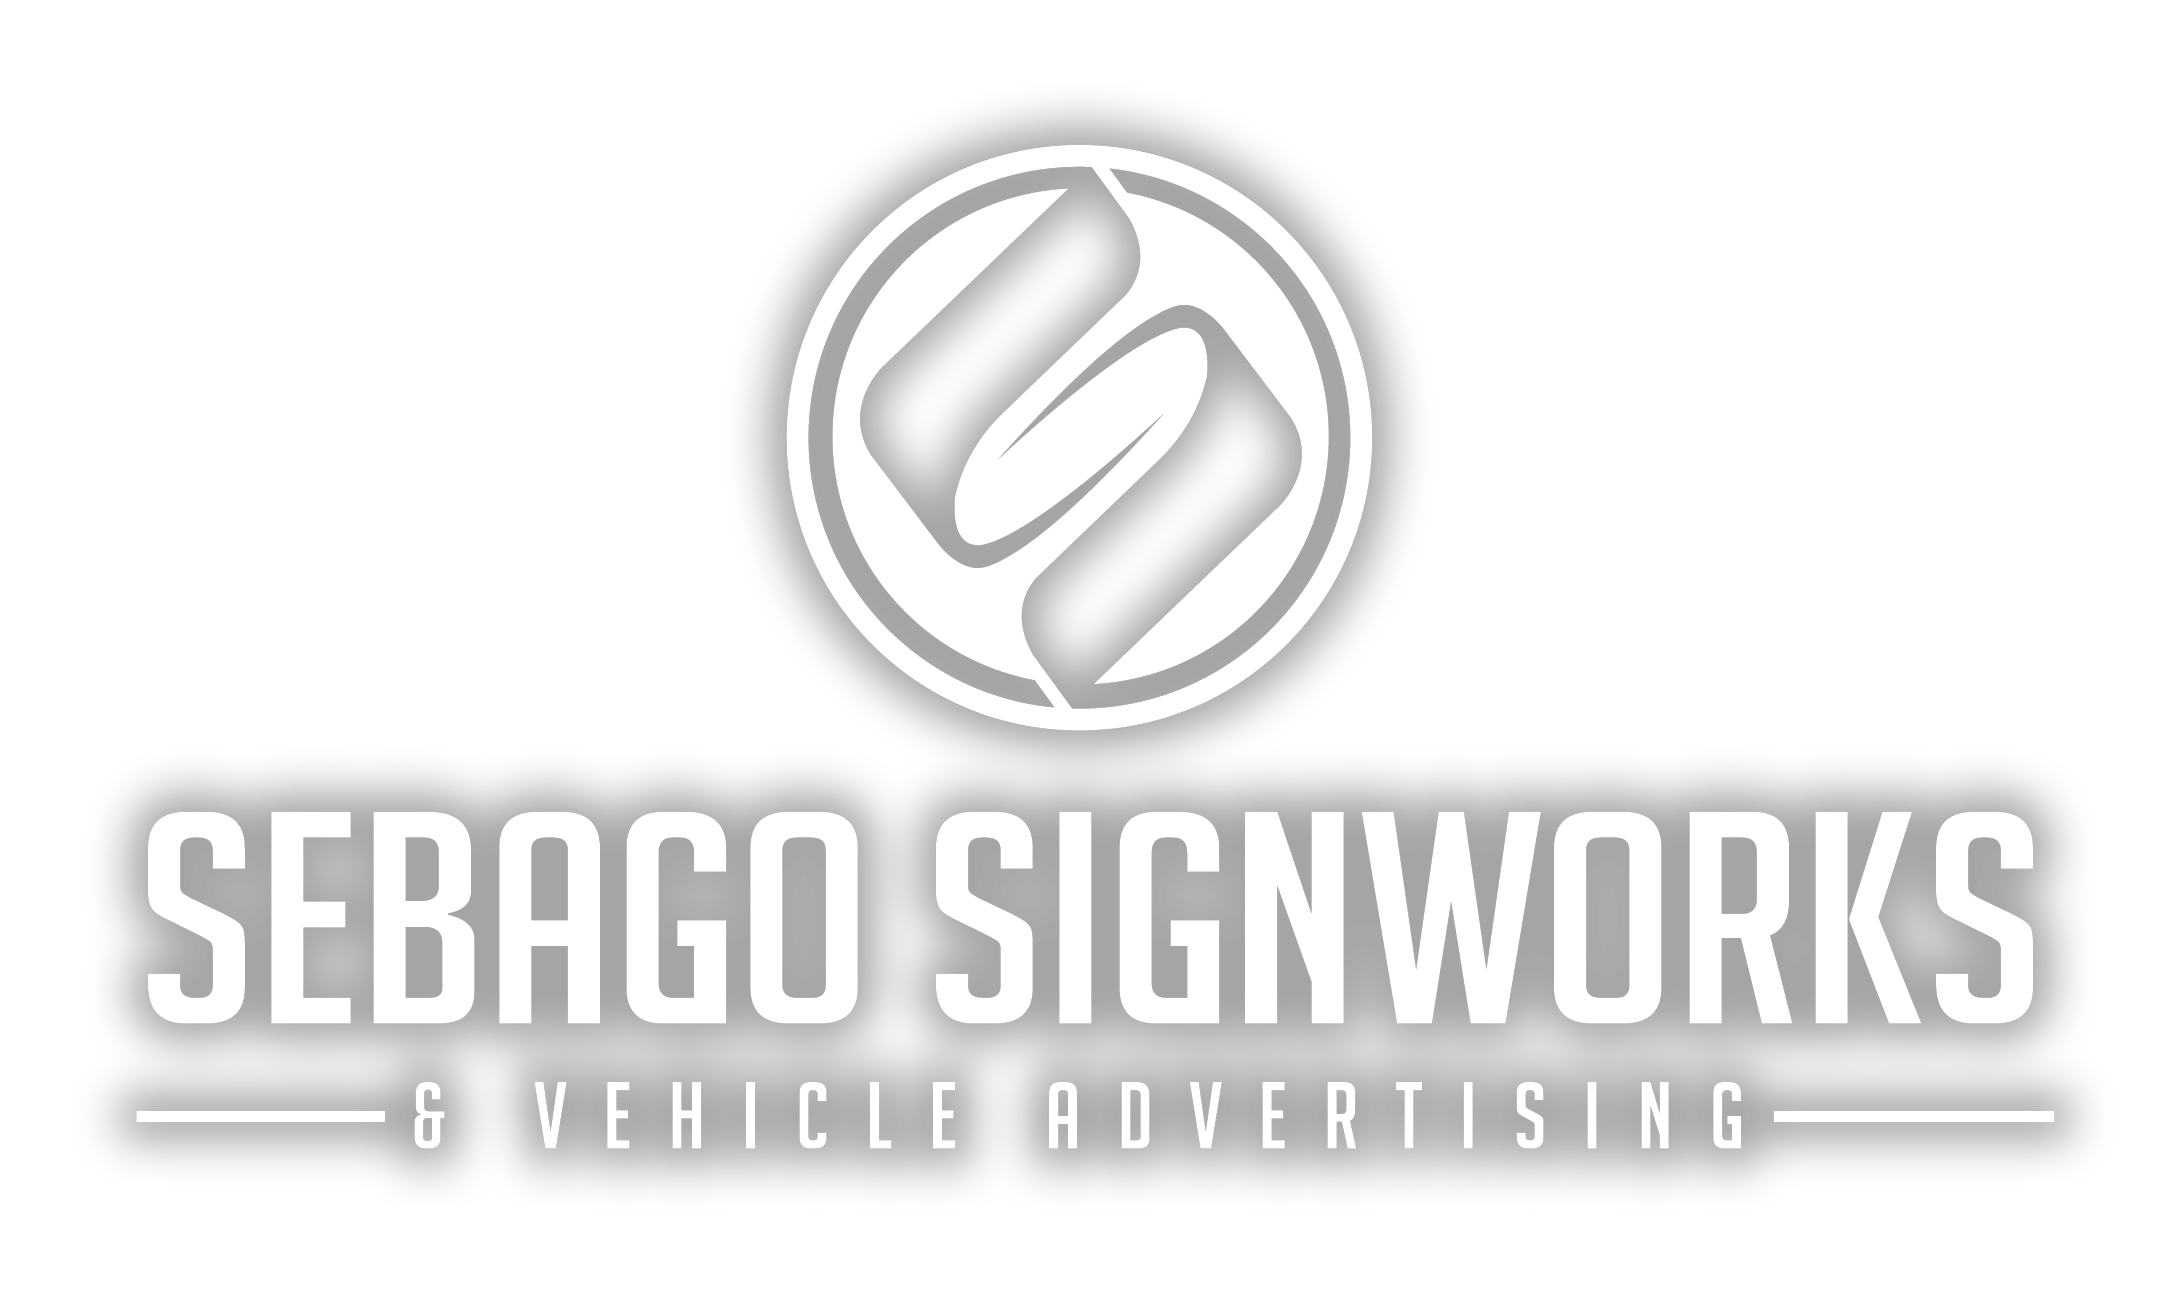 Sebago Signworks And Vehicle Advertising